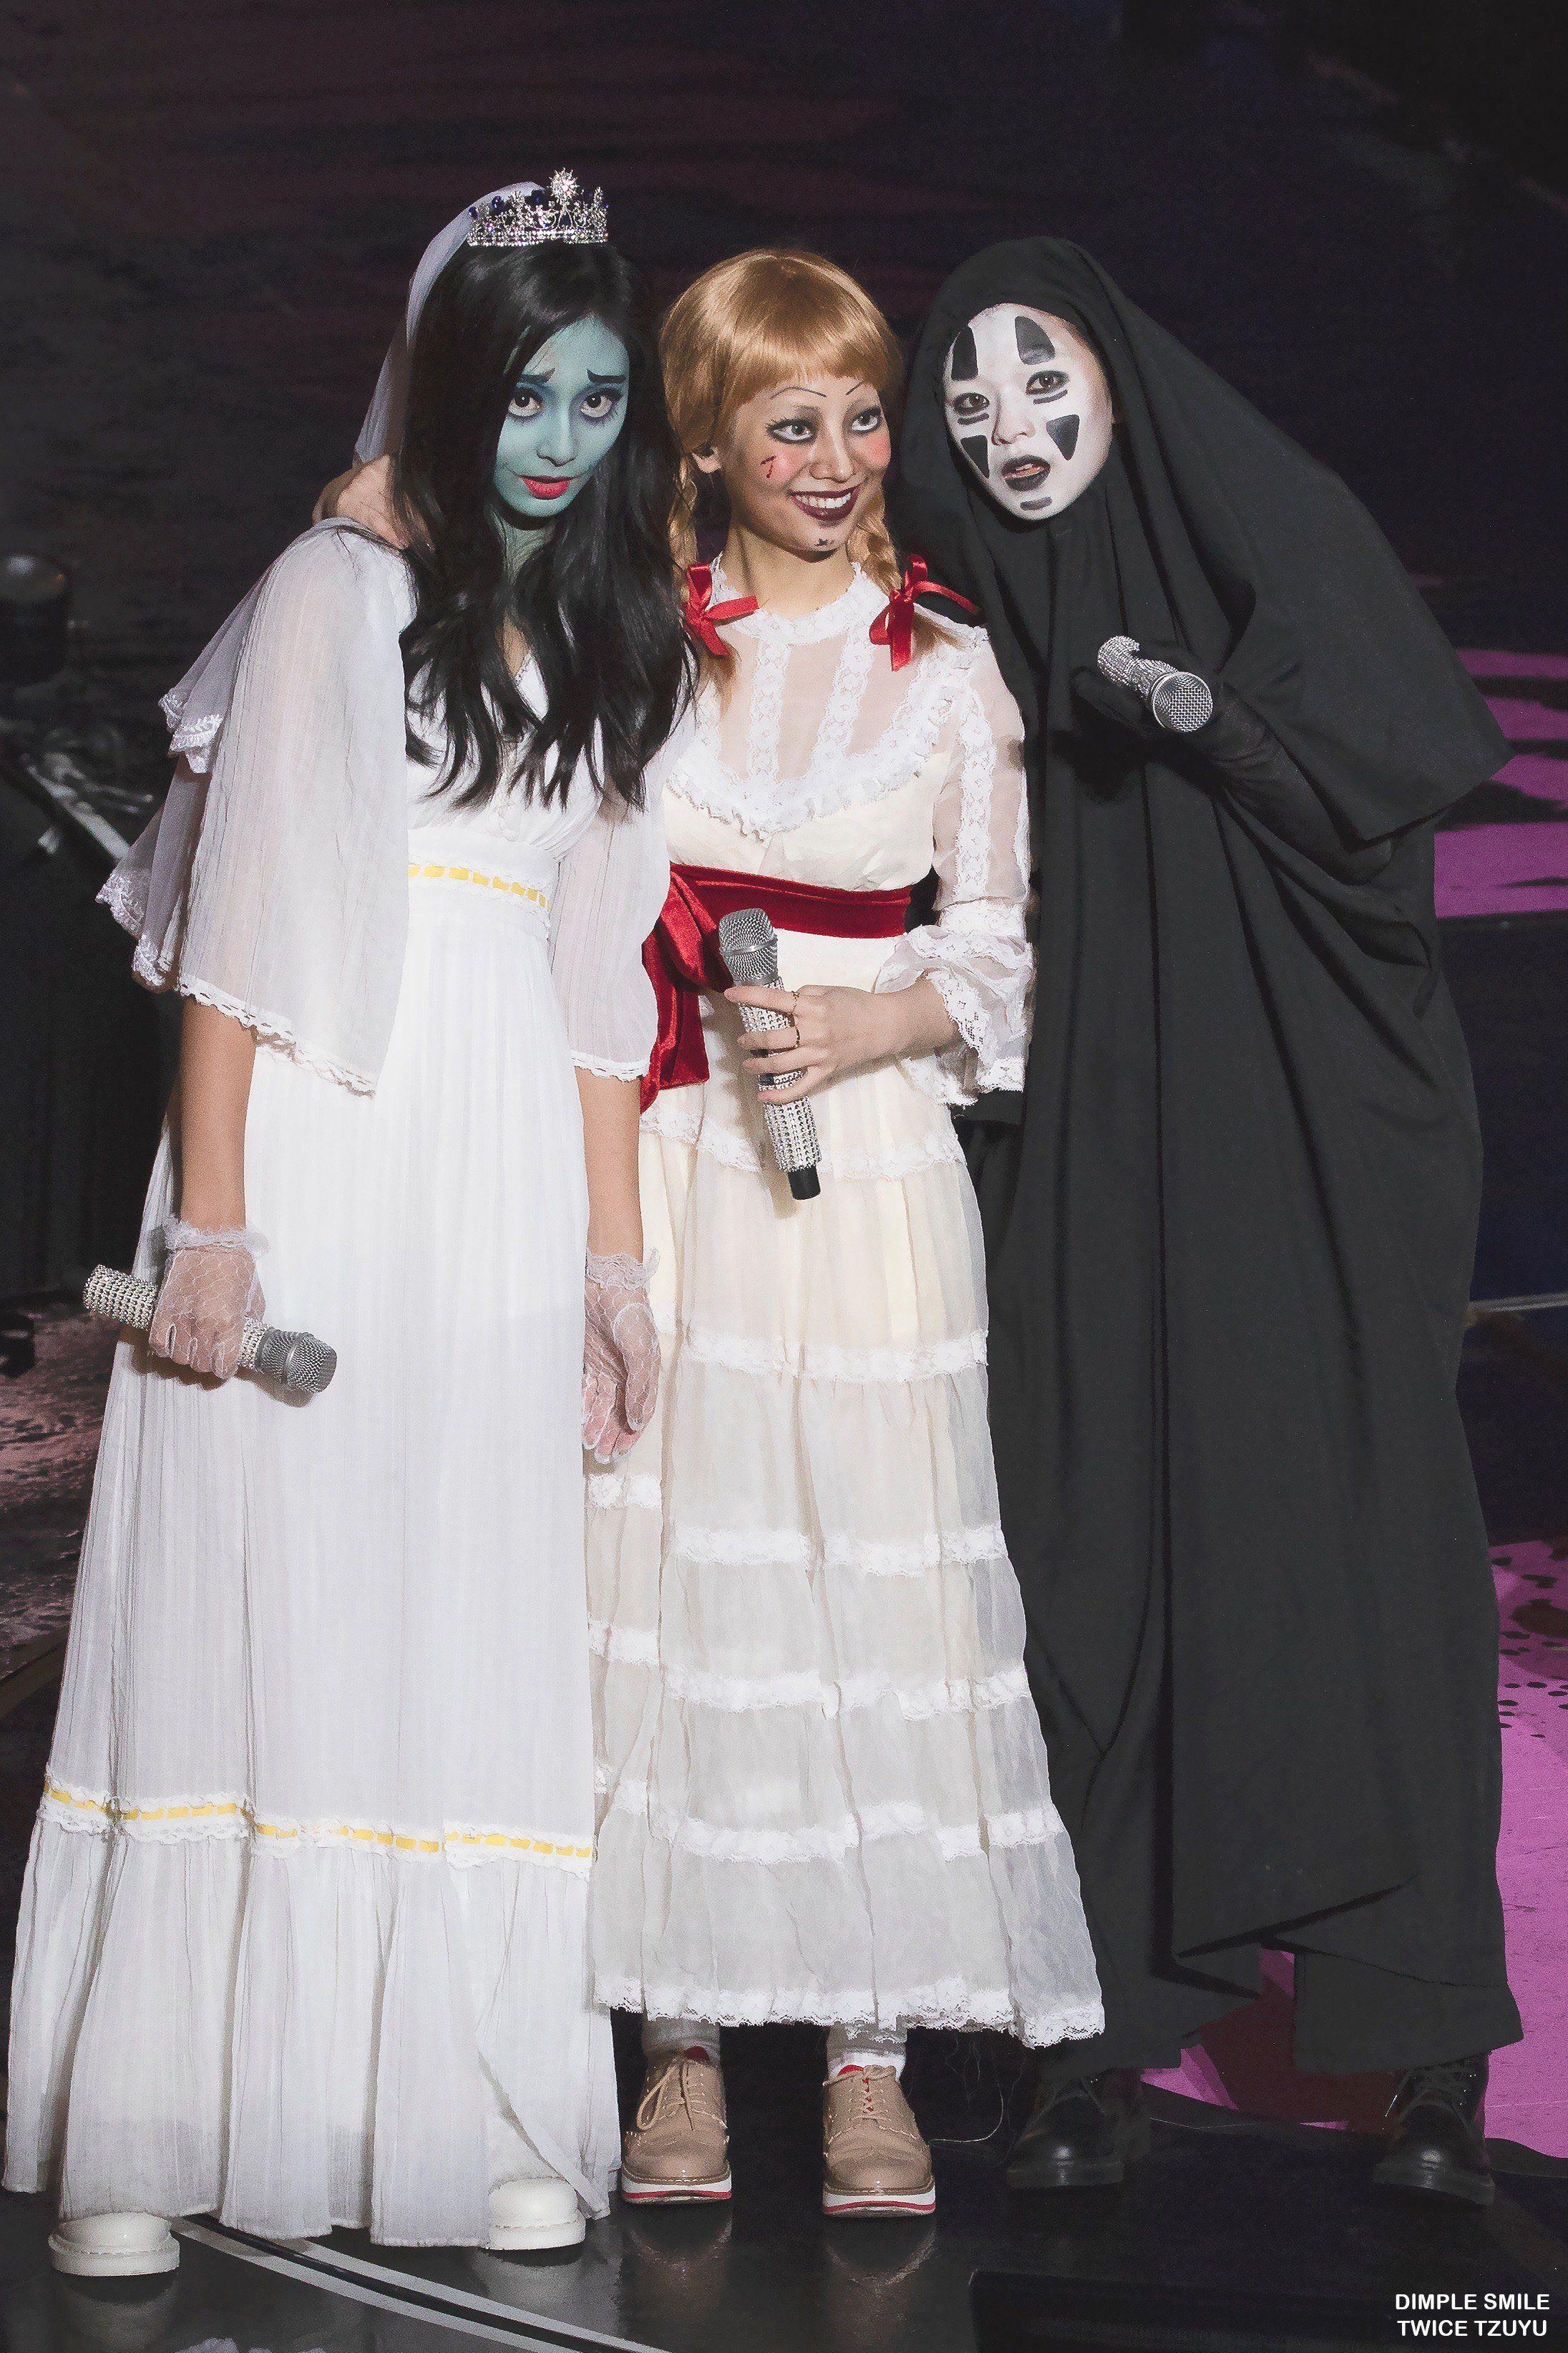 Twice Tzuyu Dahyun And Jeongyeon Kpop Halloween Costume Kpop Girls Kpop Costume